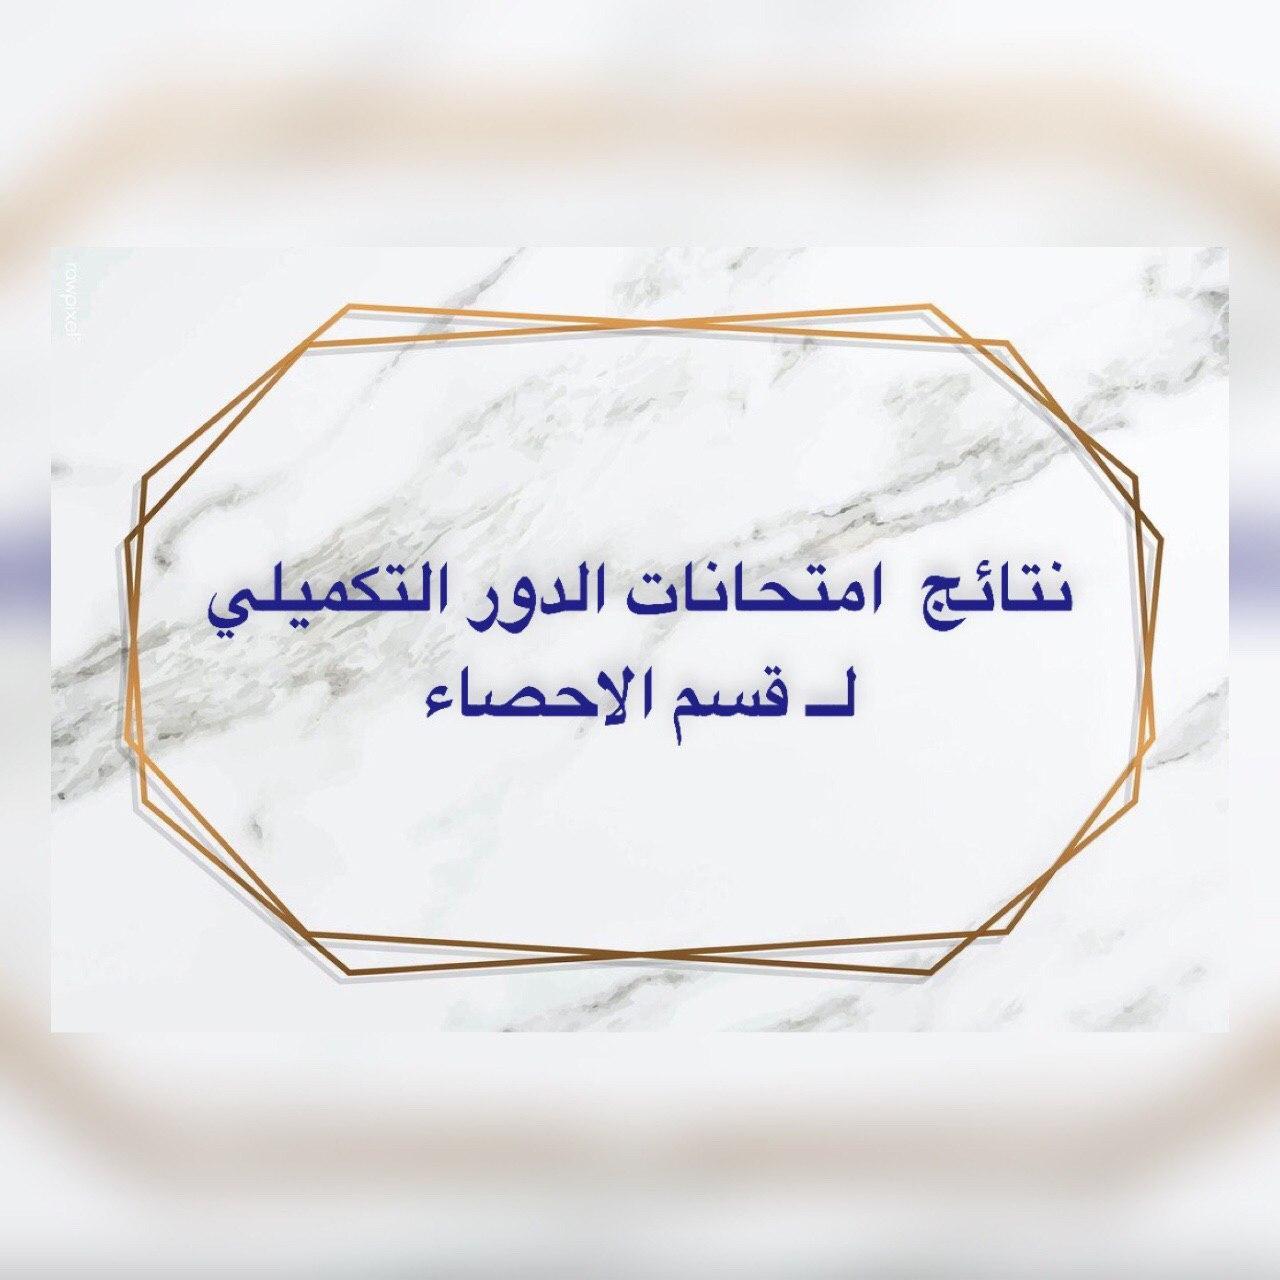 Read more about the article نتائج الدور التكميلي لــ قسم الاحصاء